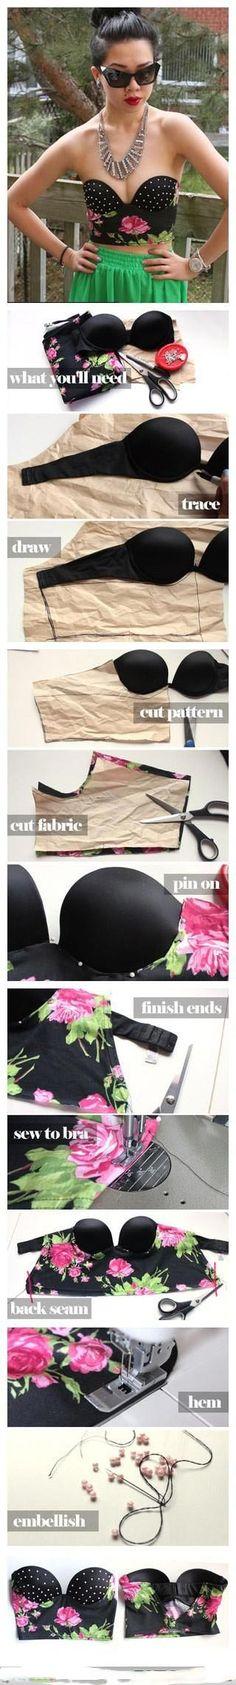 Creative way to use an old bra